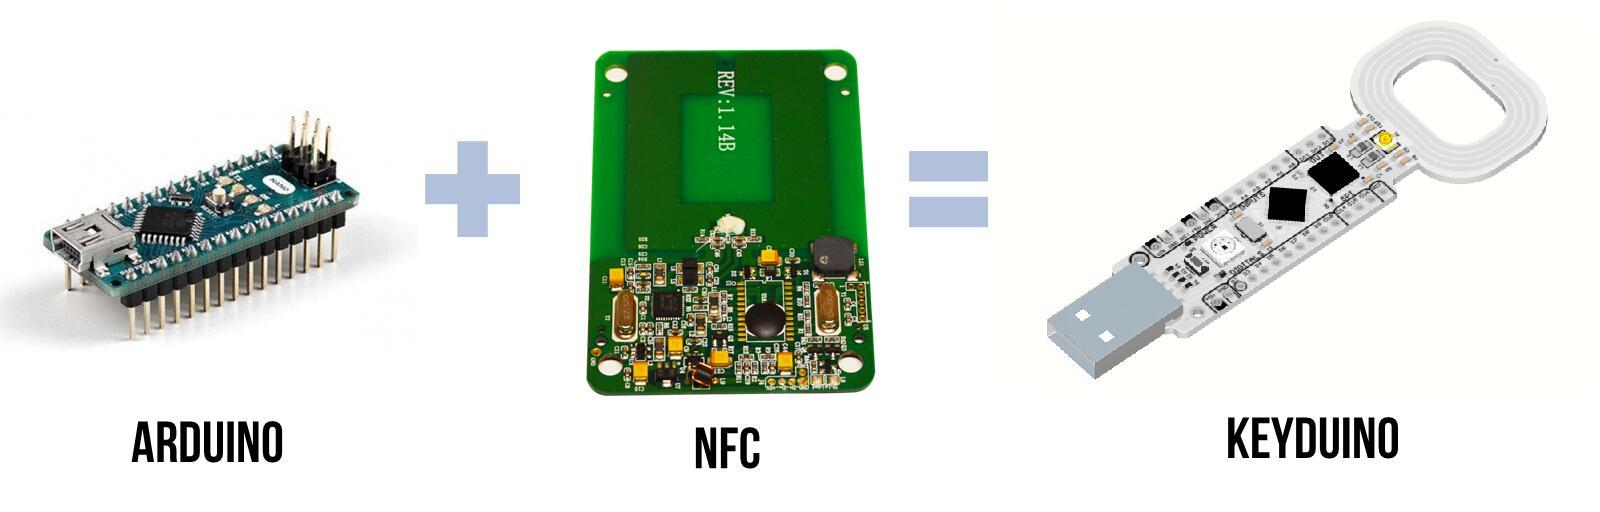 KeyDuino NANO - arduino compatible NFC board